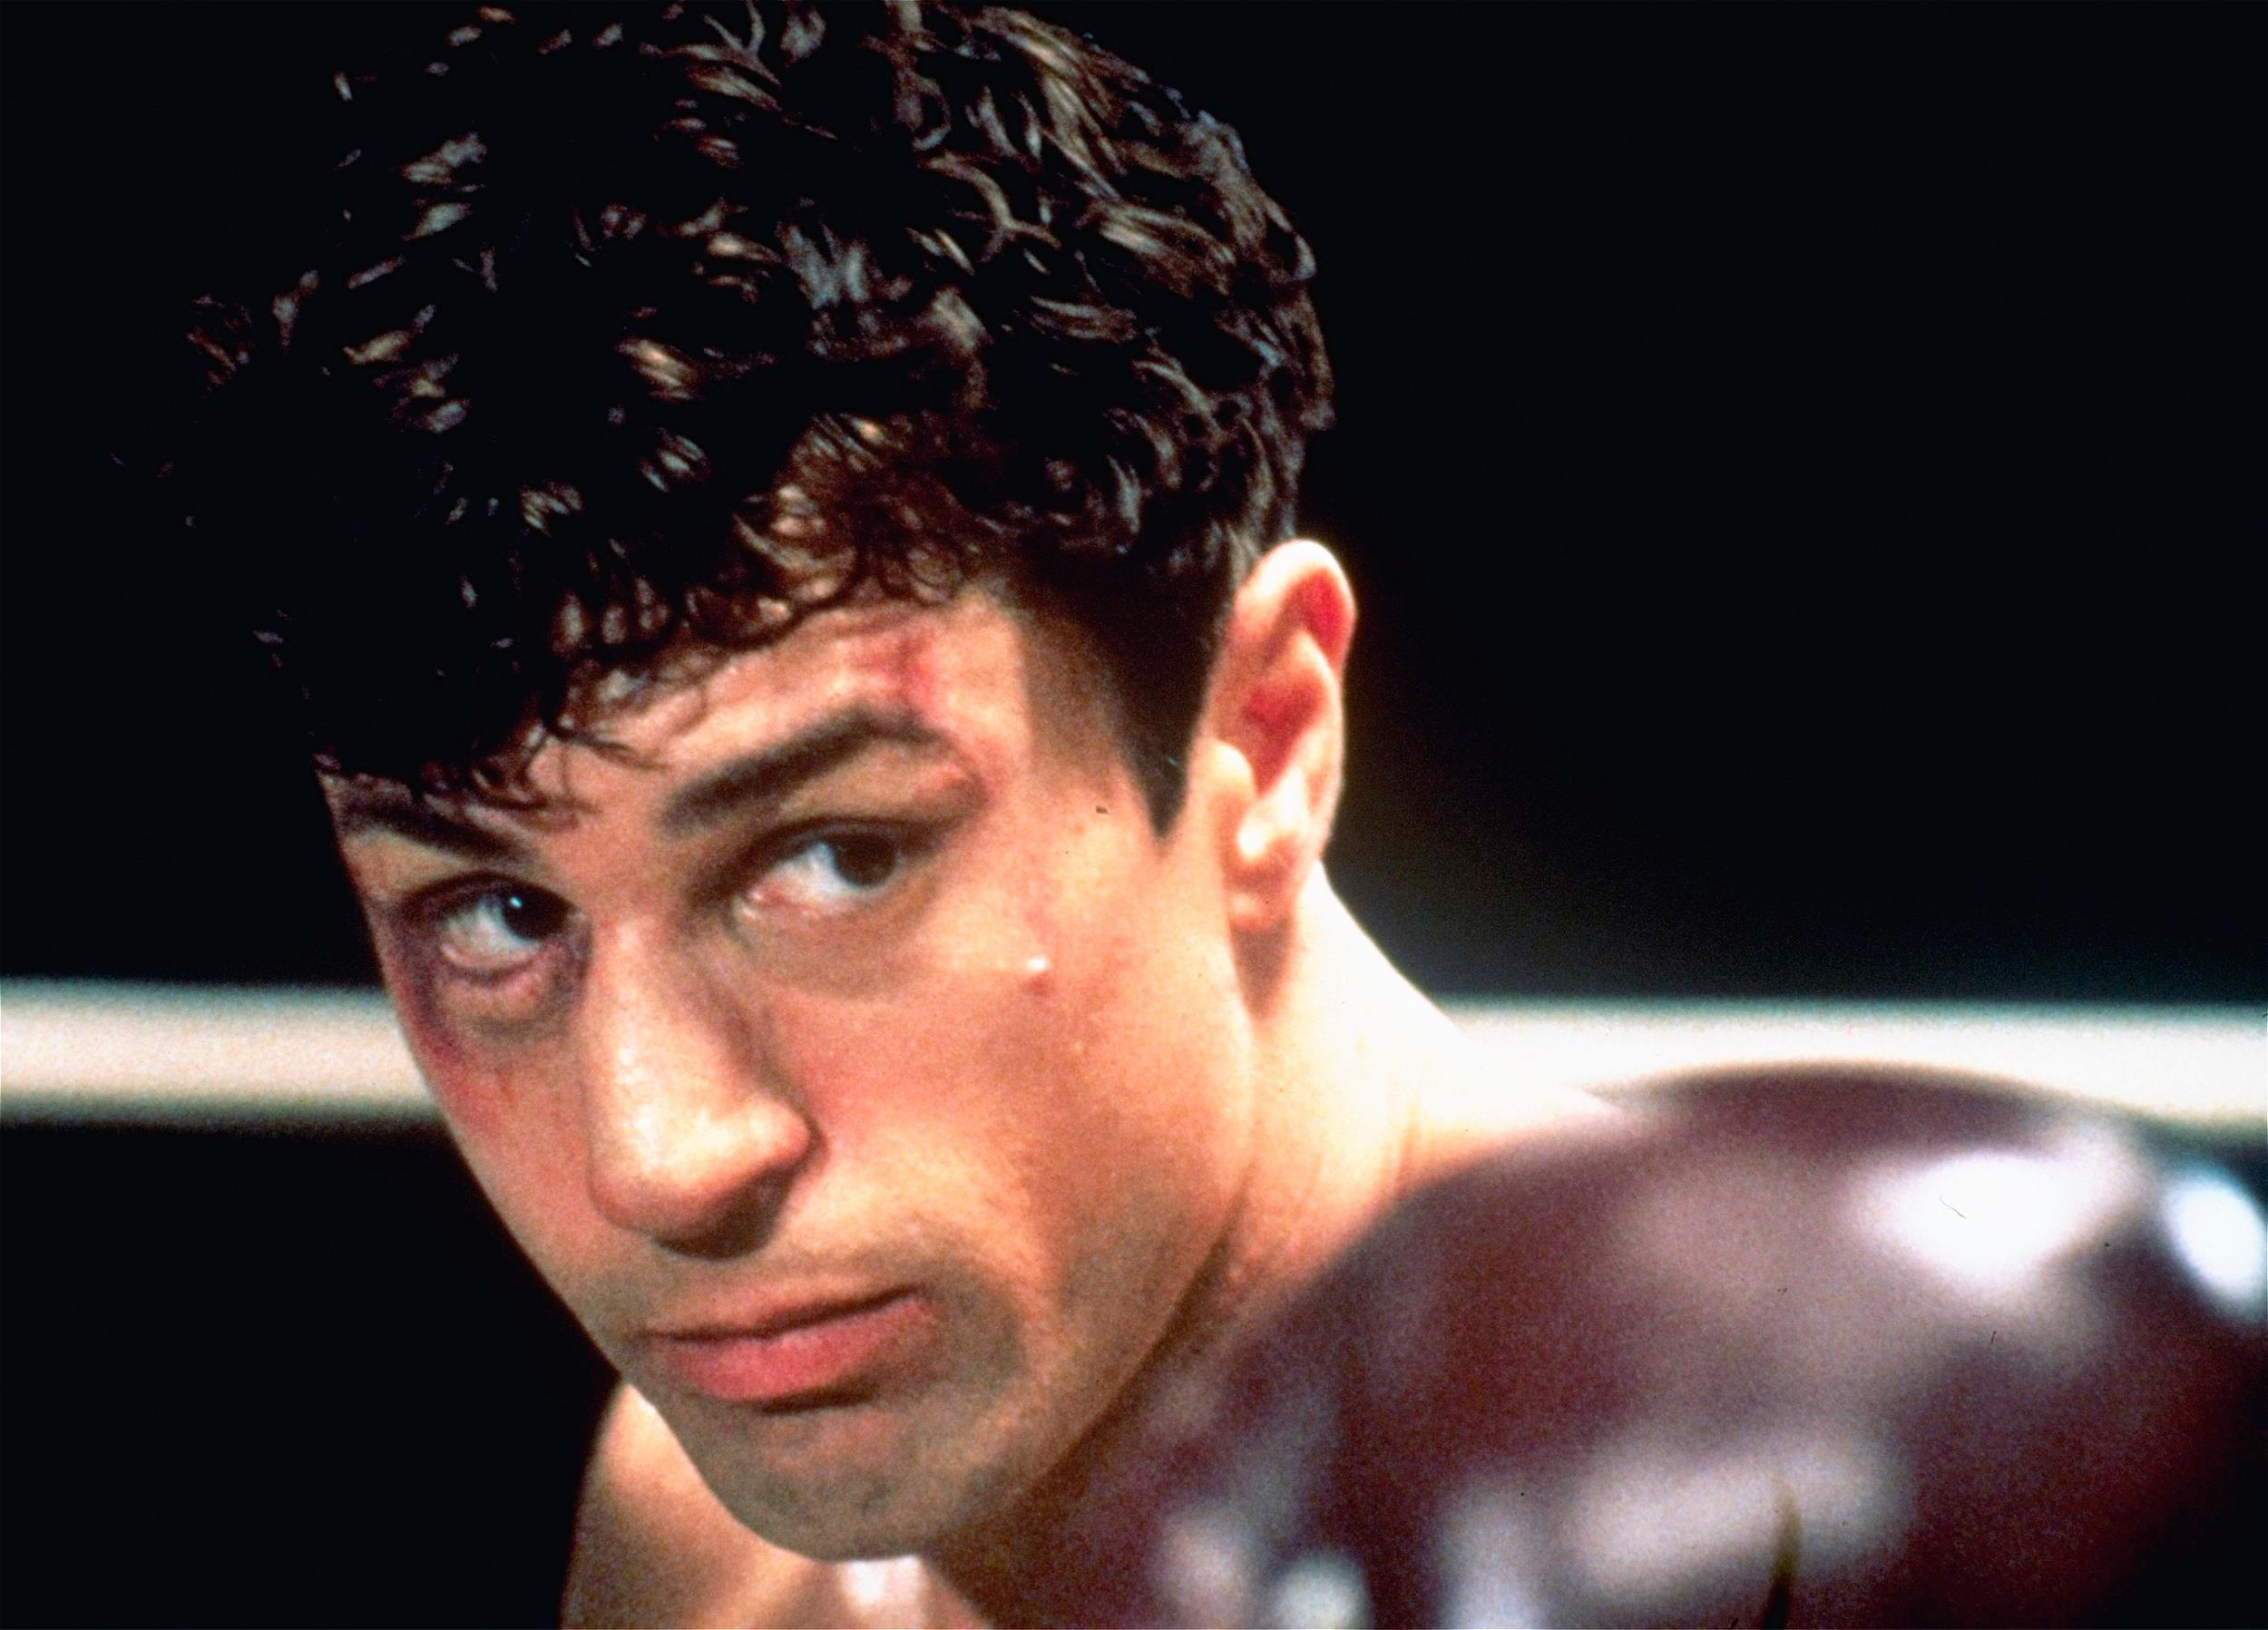 Image: This 1980 file photo showing Robert De Niro as Jake La Motta in a boxing scene from Martin Scorsese's film